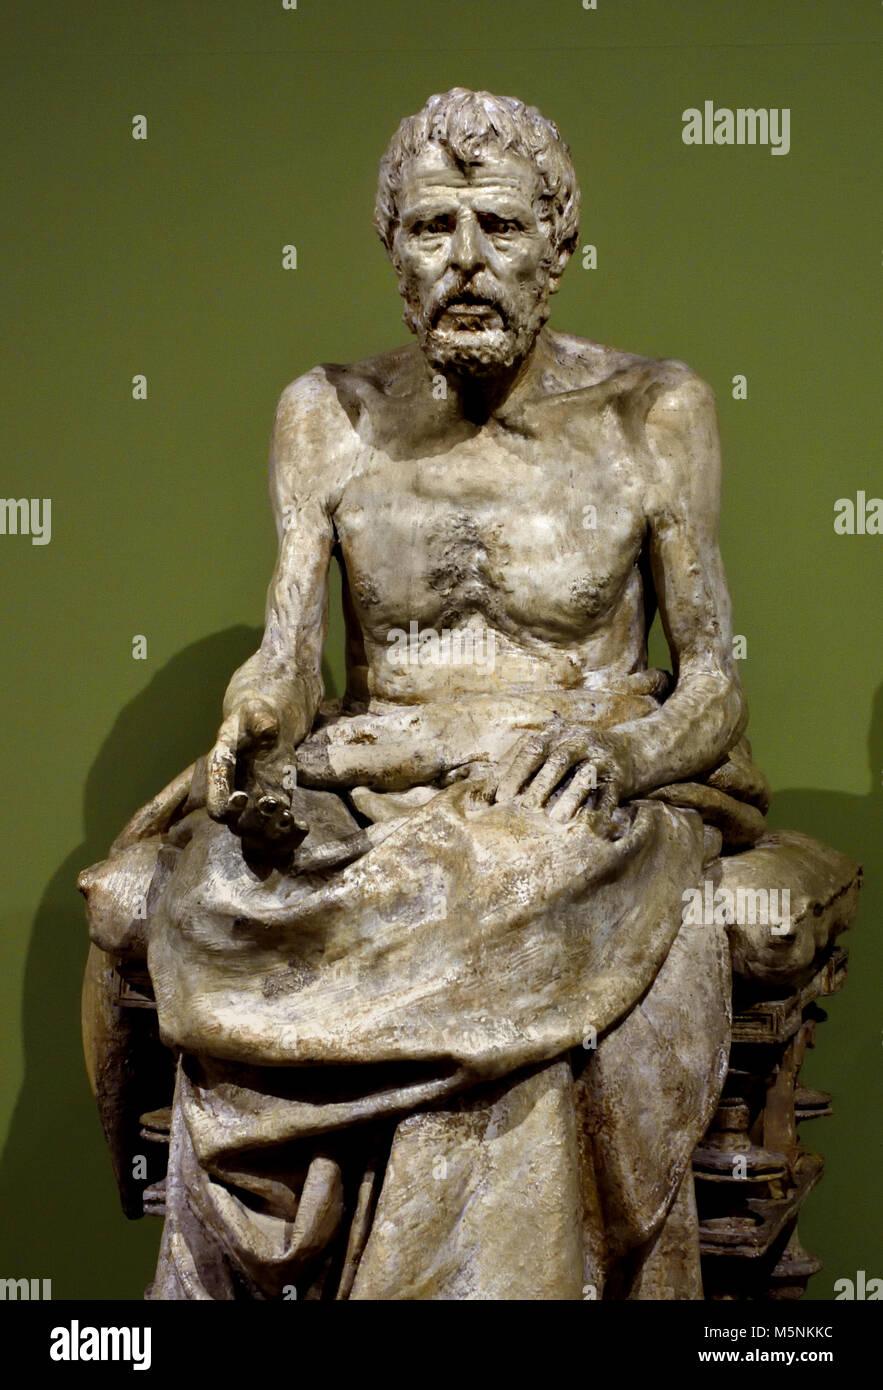 Lucius Annaeus Seneca 1894 by Mateo Inurria Lainosa 1867, Córdoba - 1924, Madrid) was a Spanish sculptor, 19th,century, - Stock Image